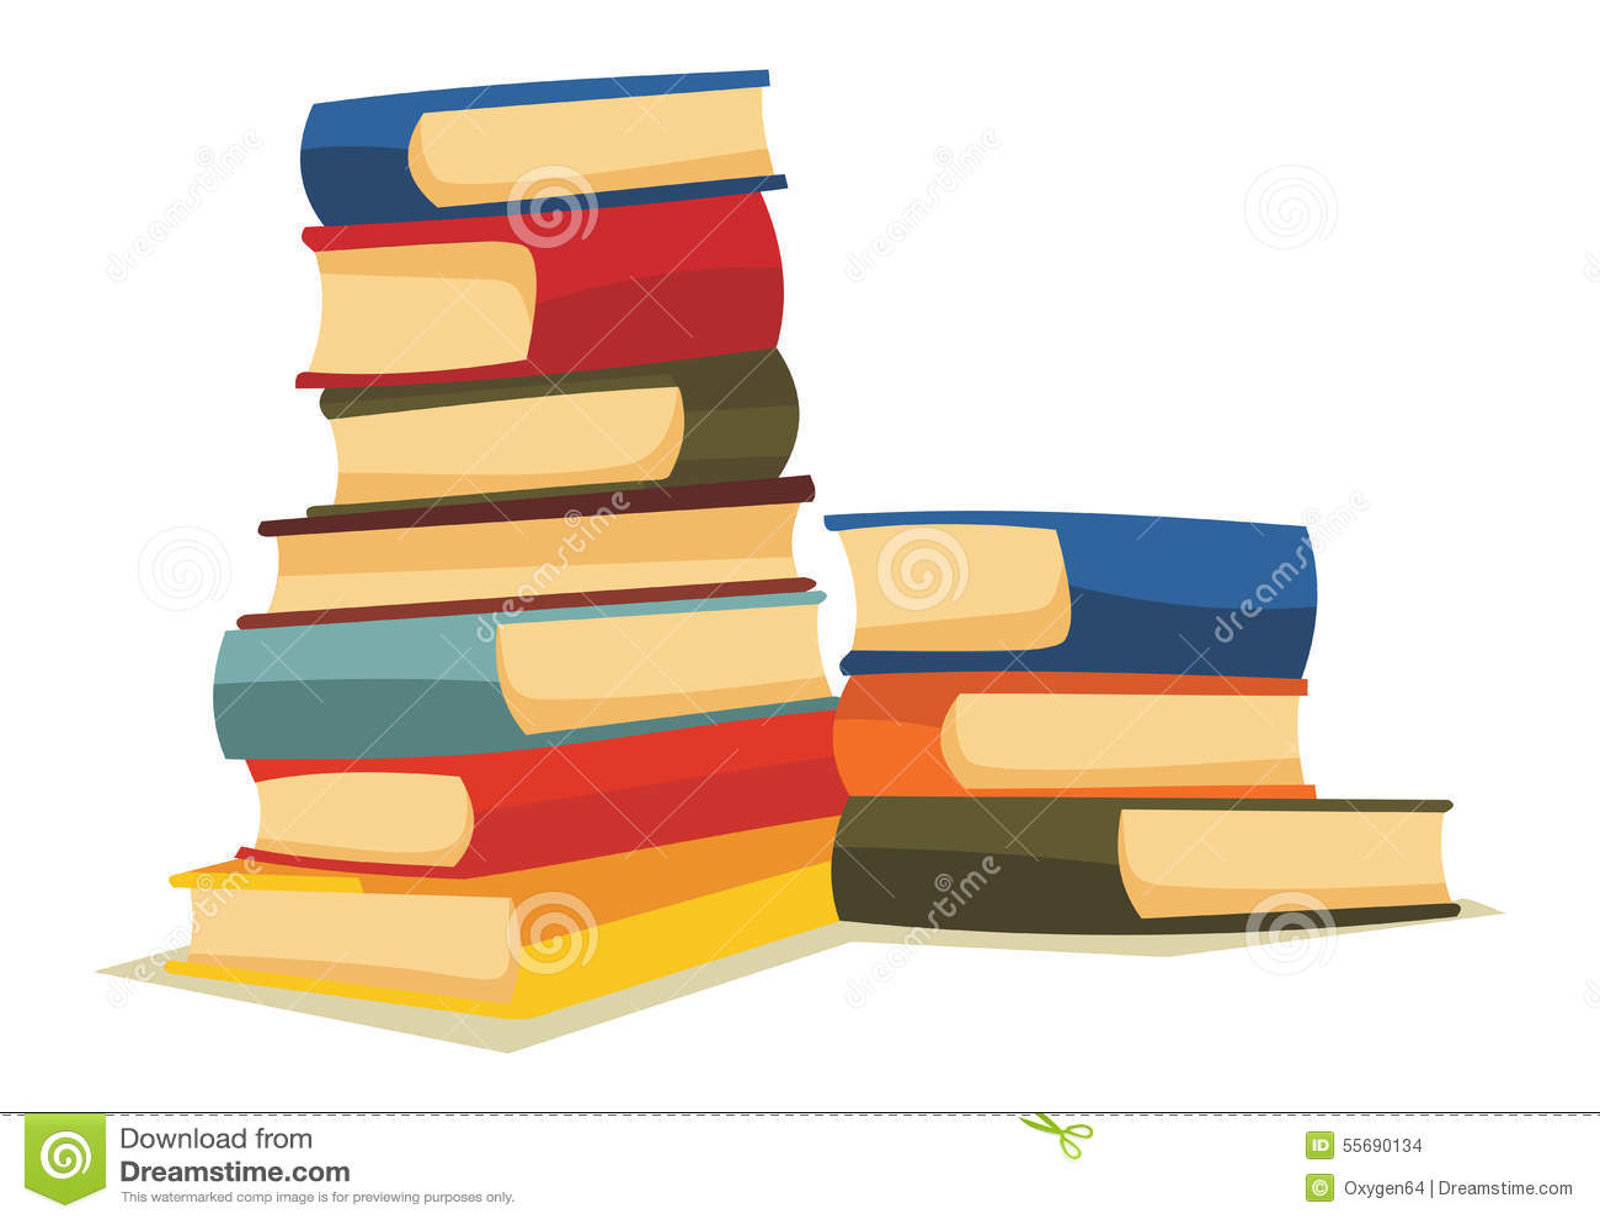 How To Read Floor Plans Cartoon Books Stock Vector Image 55690134